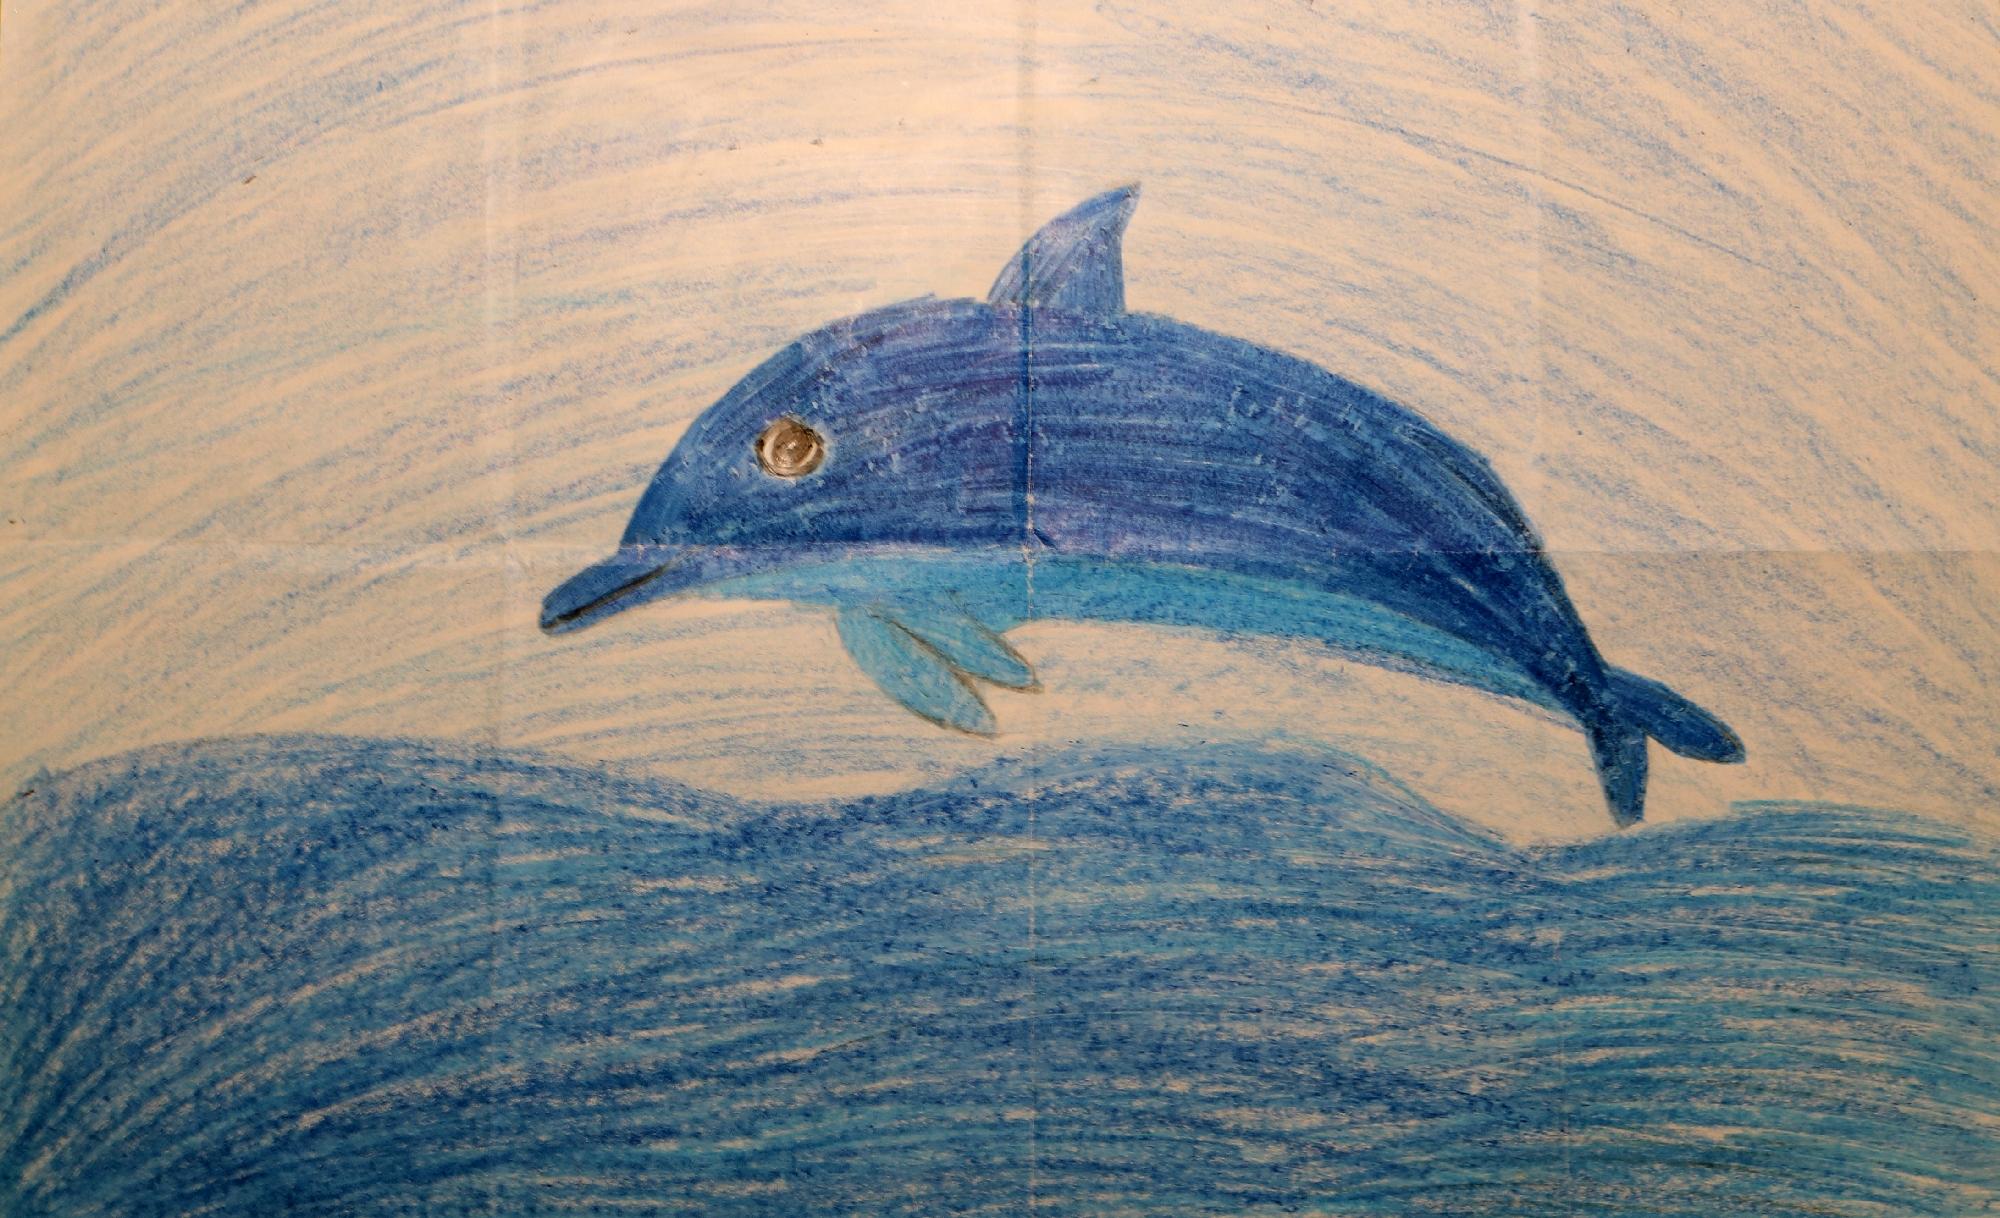 2020 Malwettbewerb Ein Delfin ohne Corona (Mahdiya 10 Jahre) web